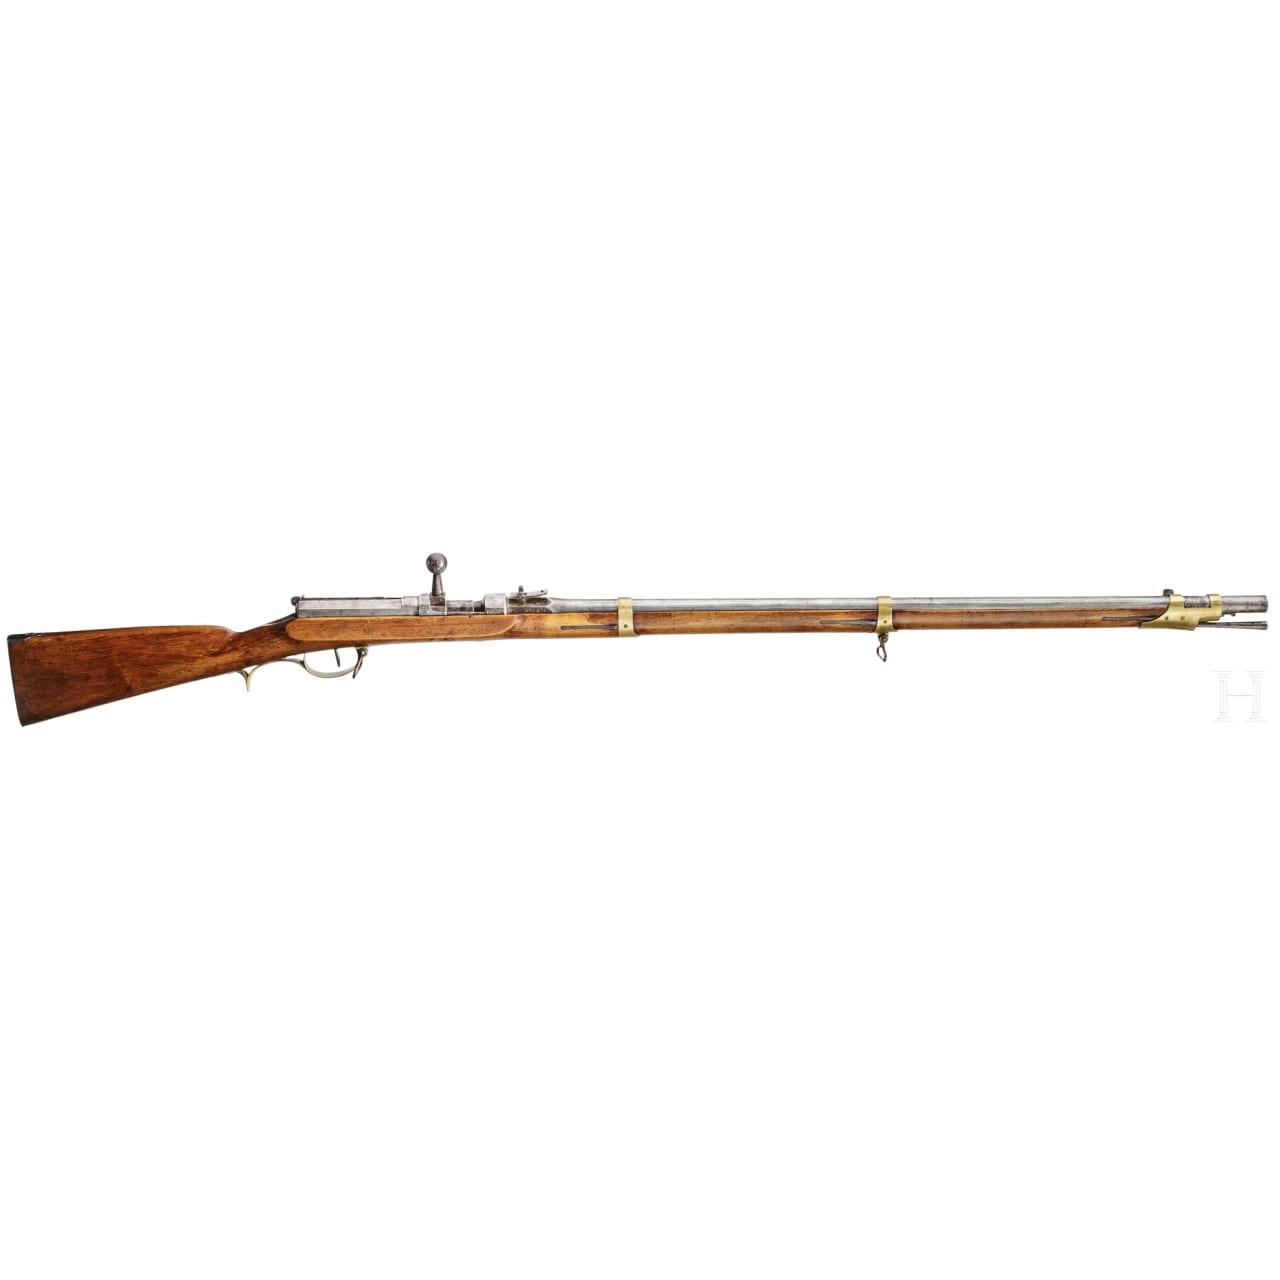 A needle fire rifle M1841